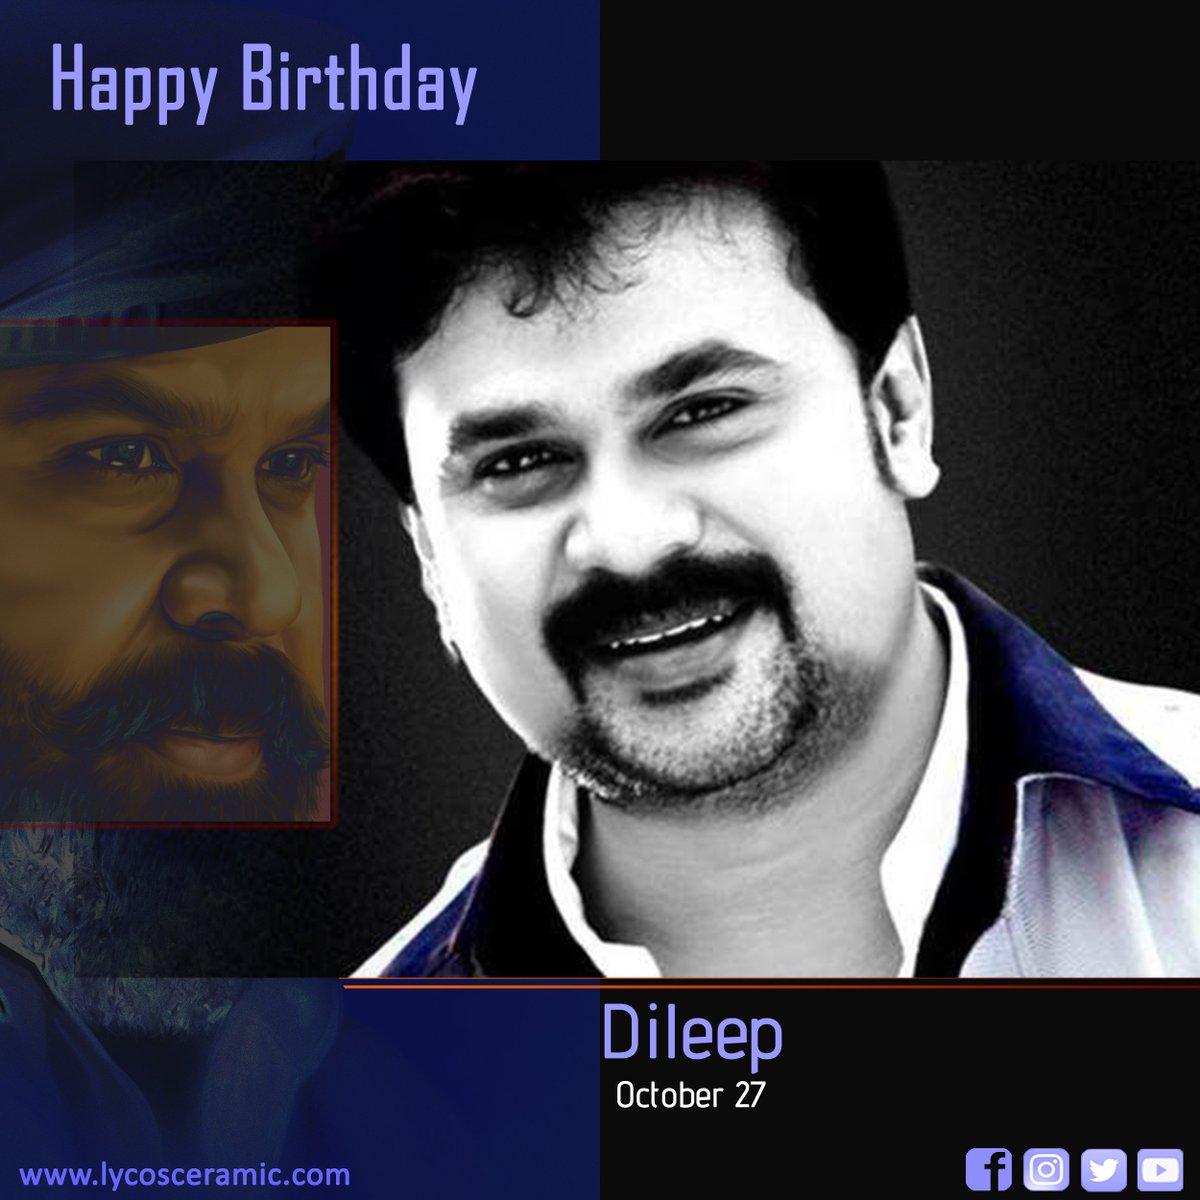 Wish You A Very Happy Birthday to #Dileep sir, https://t.co/lr0RfcIQI7  #HappyBirthdayDileep #Kerala #MalayalamMovie #Malayalam #HappyBirthday #Birthday #LycosCeramic #LycosGroup #LycosTile #Lycos https://t.co/If6O4SwnXk